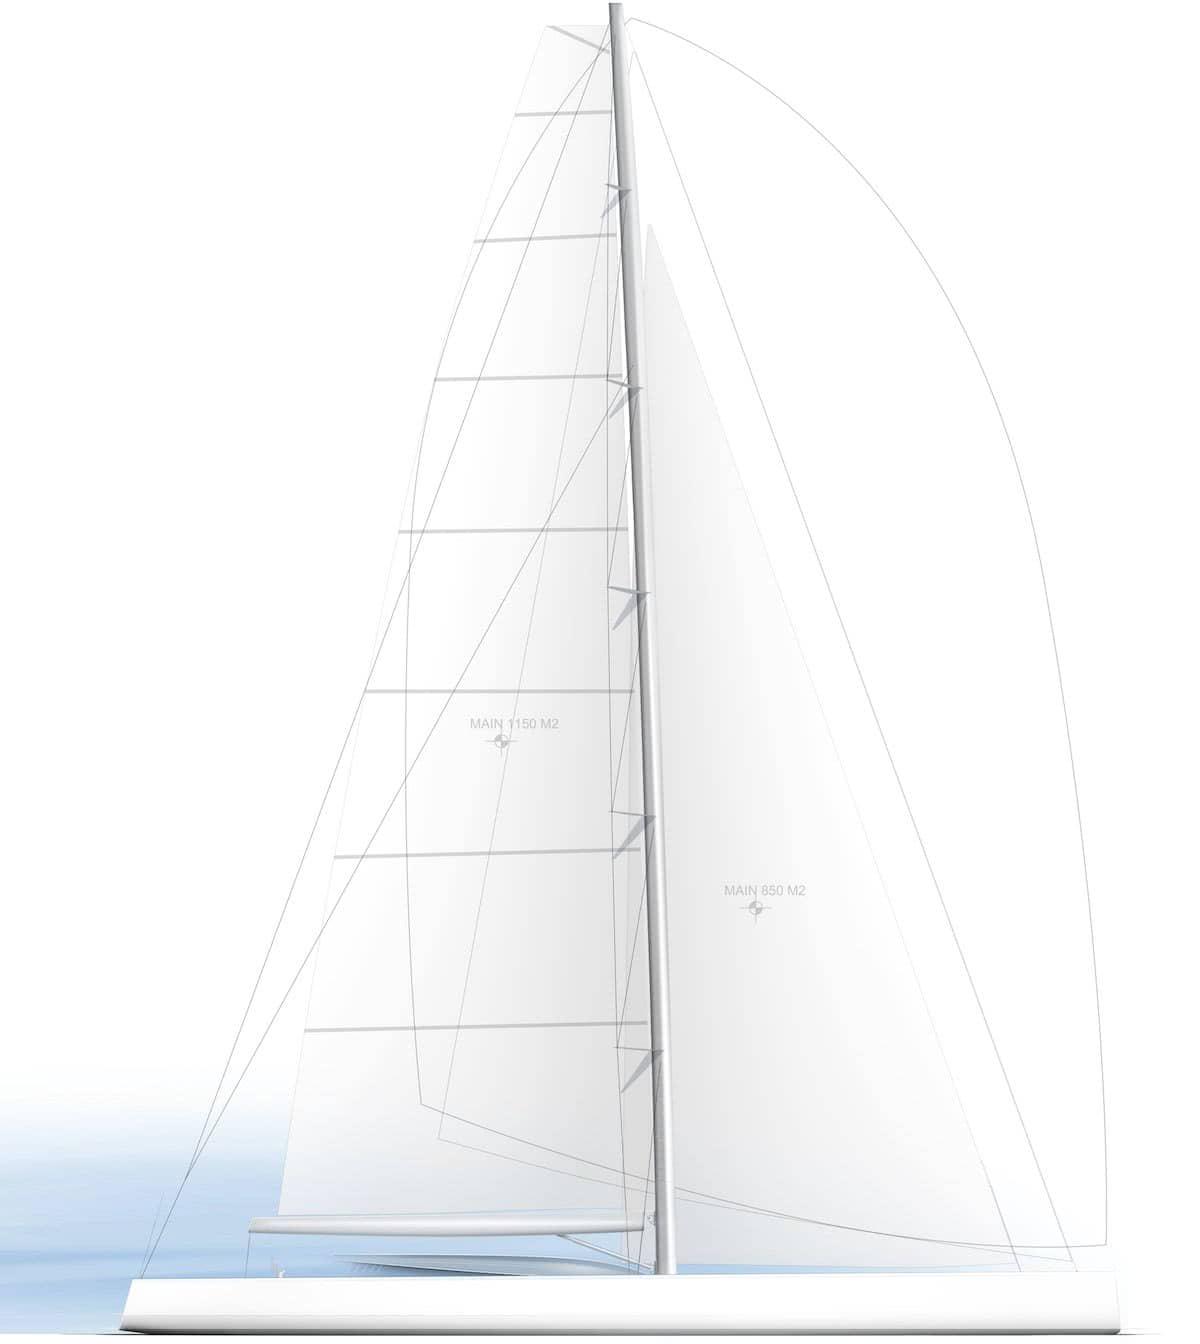 Perfect 60 - Philippe Briand Sailing Yacht